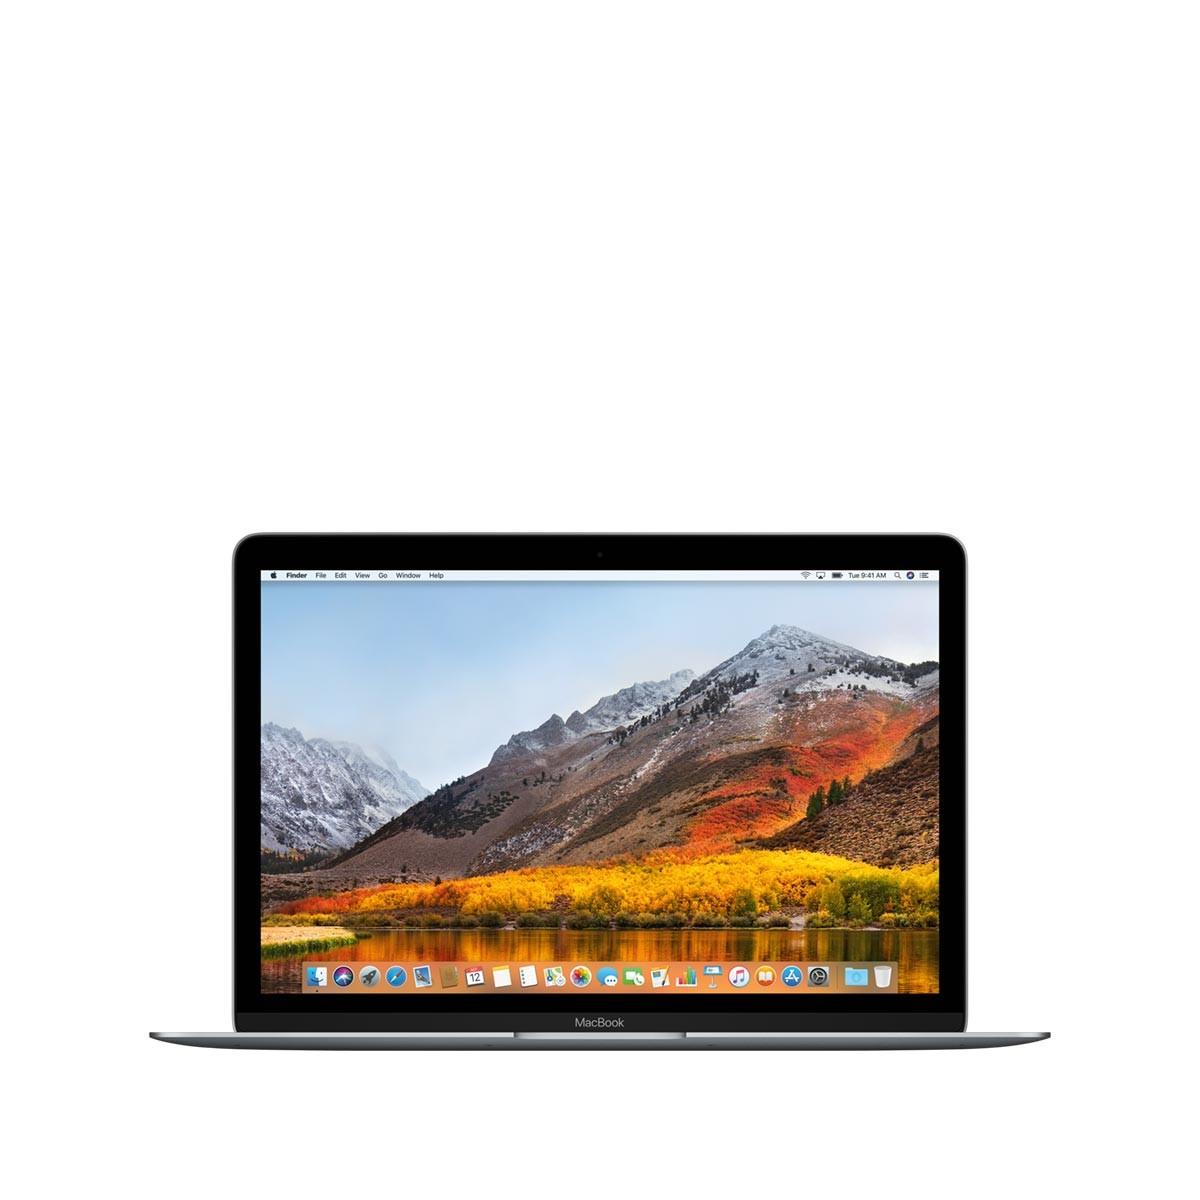 "Тъмносив лаптоп Apple MacBook"" с двуядрен 1,2GHz Intel Core m3 процесор, 256GB SSD памет - международна клавиатура"